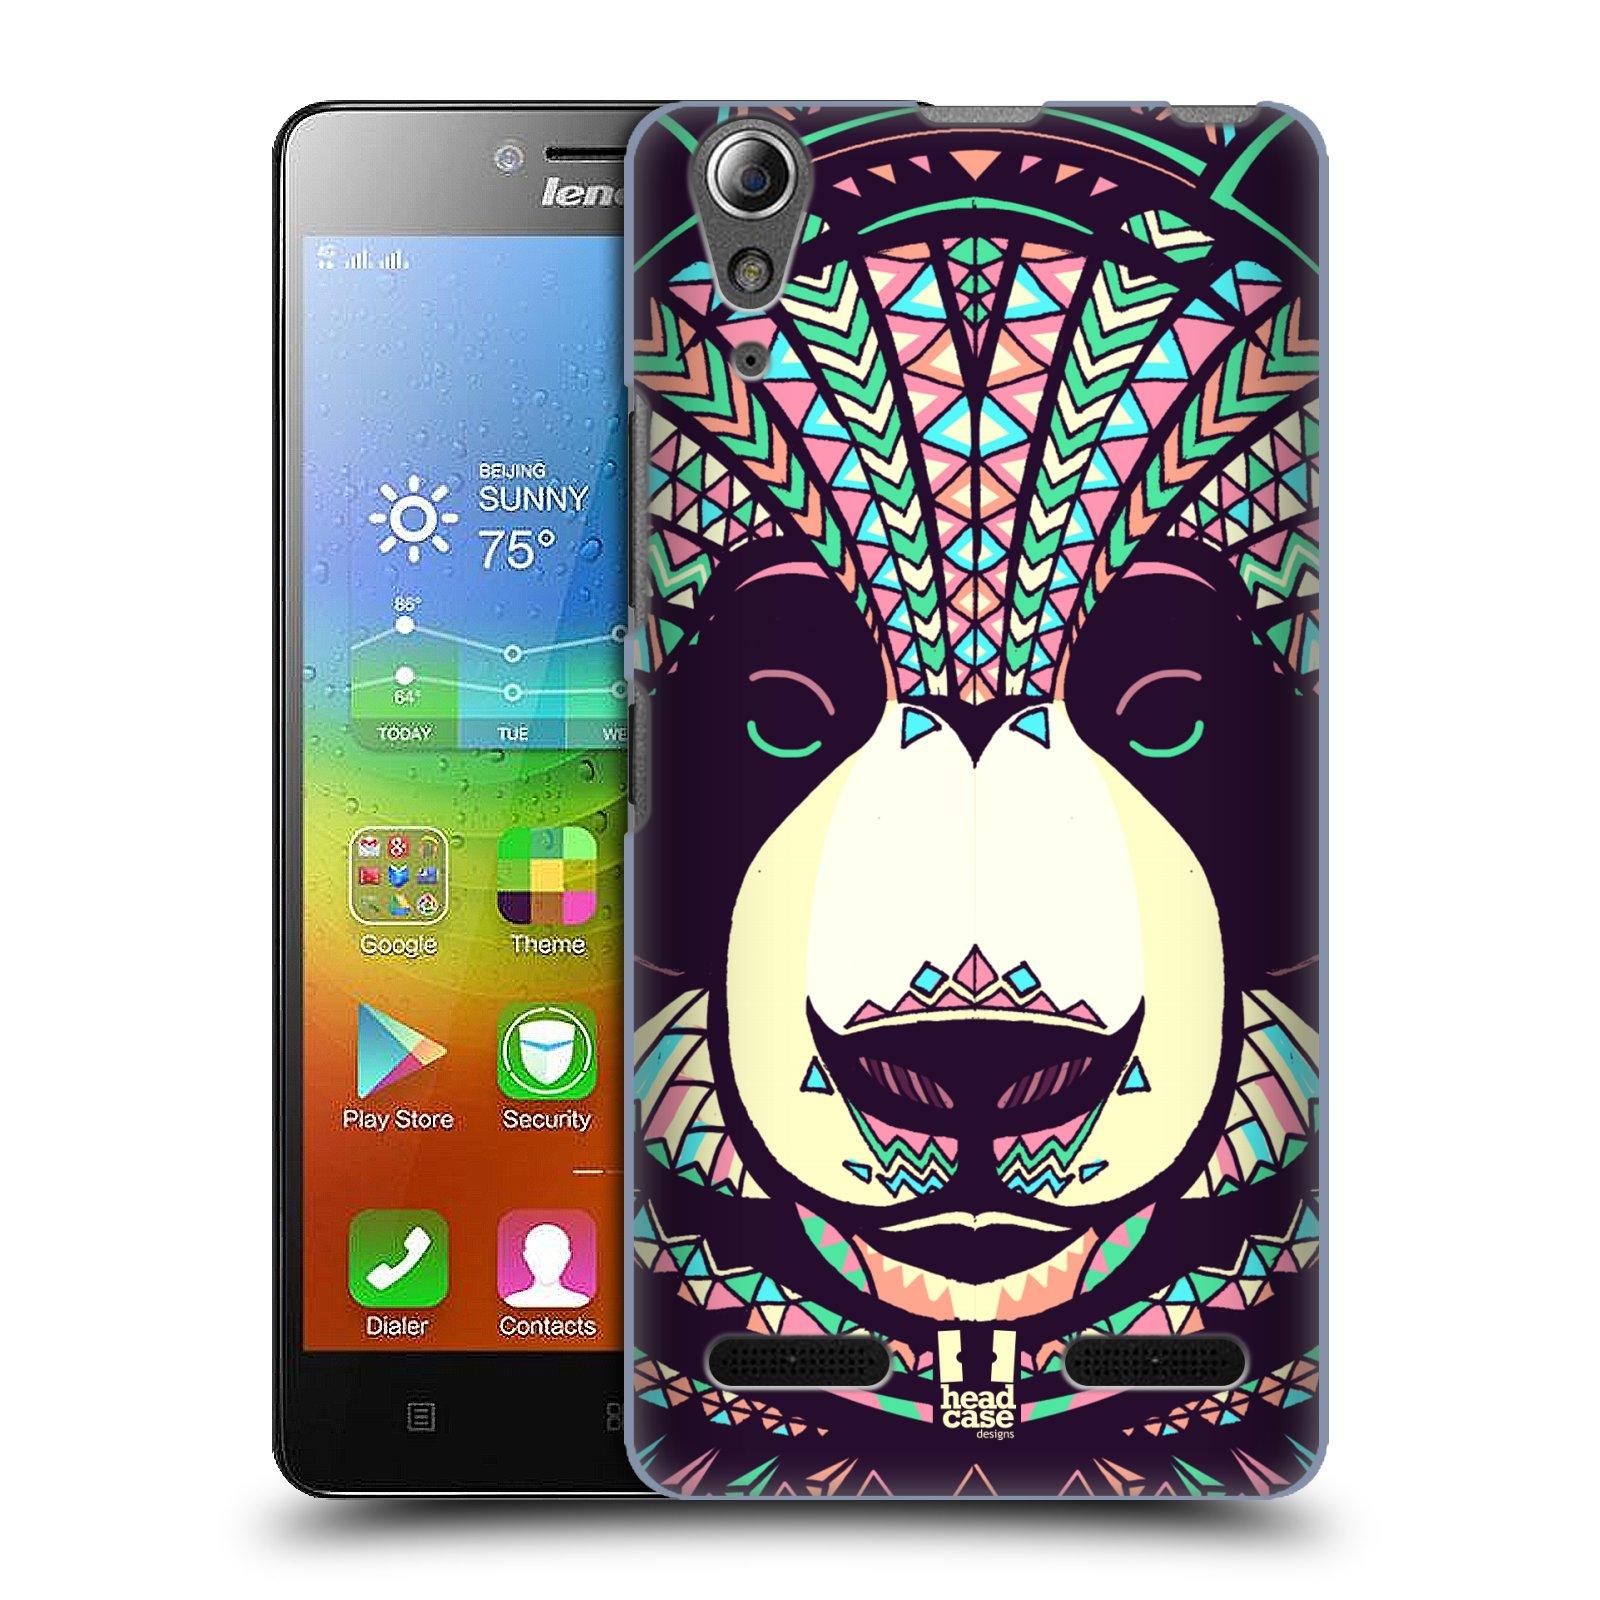 HEAD CASE pevný plastový obal na mobil LENOVO A6000 / A6000 PLUS vzor Aztécký motiv zvíře 3 panda